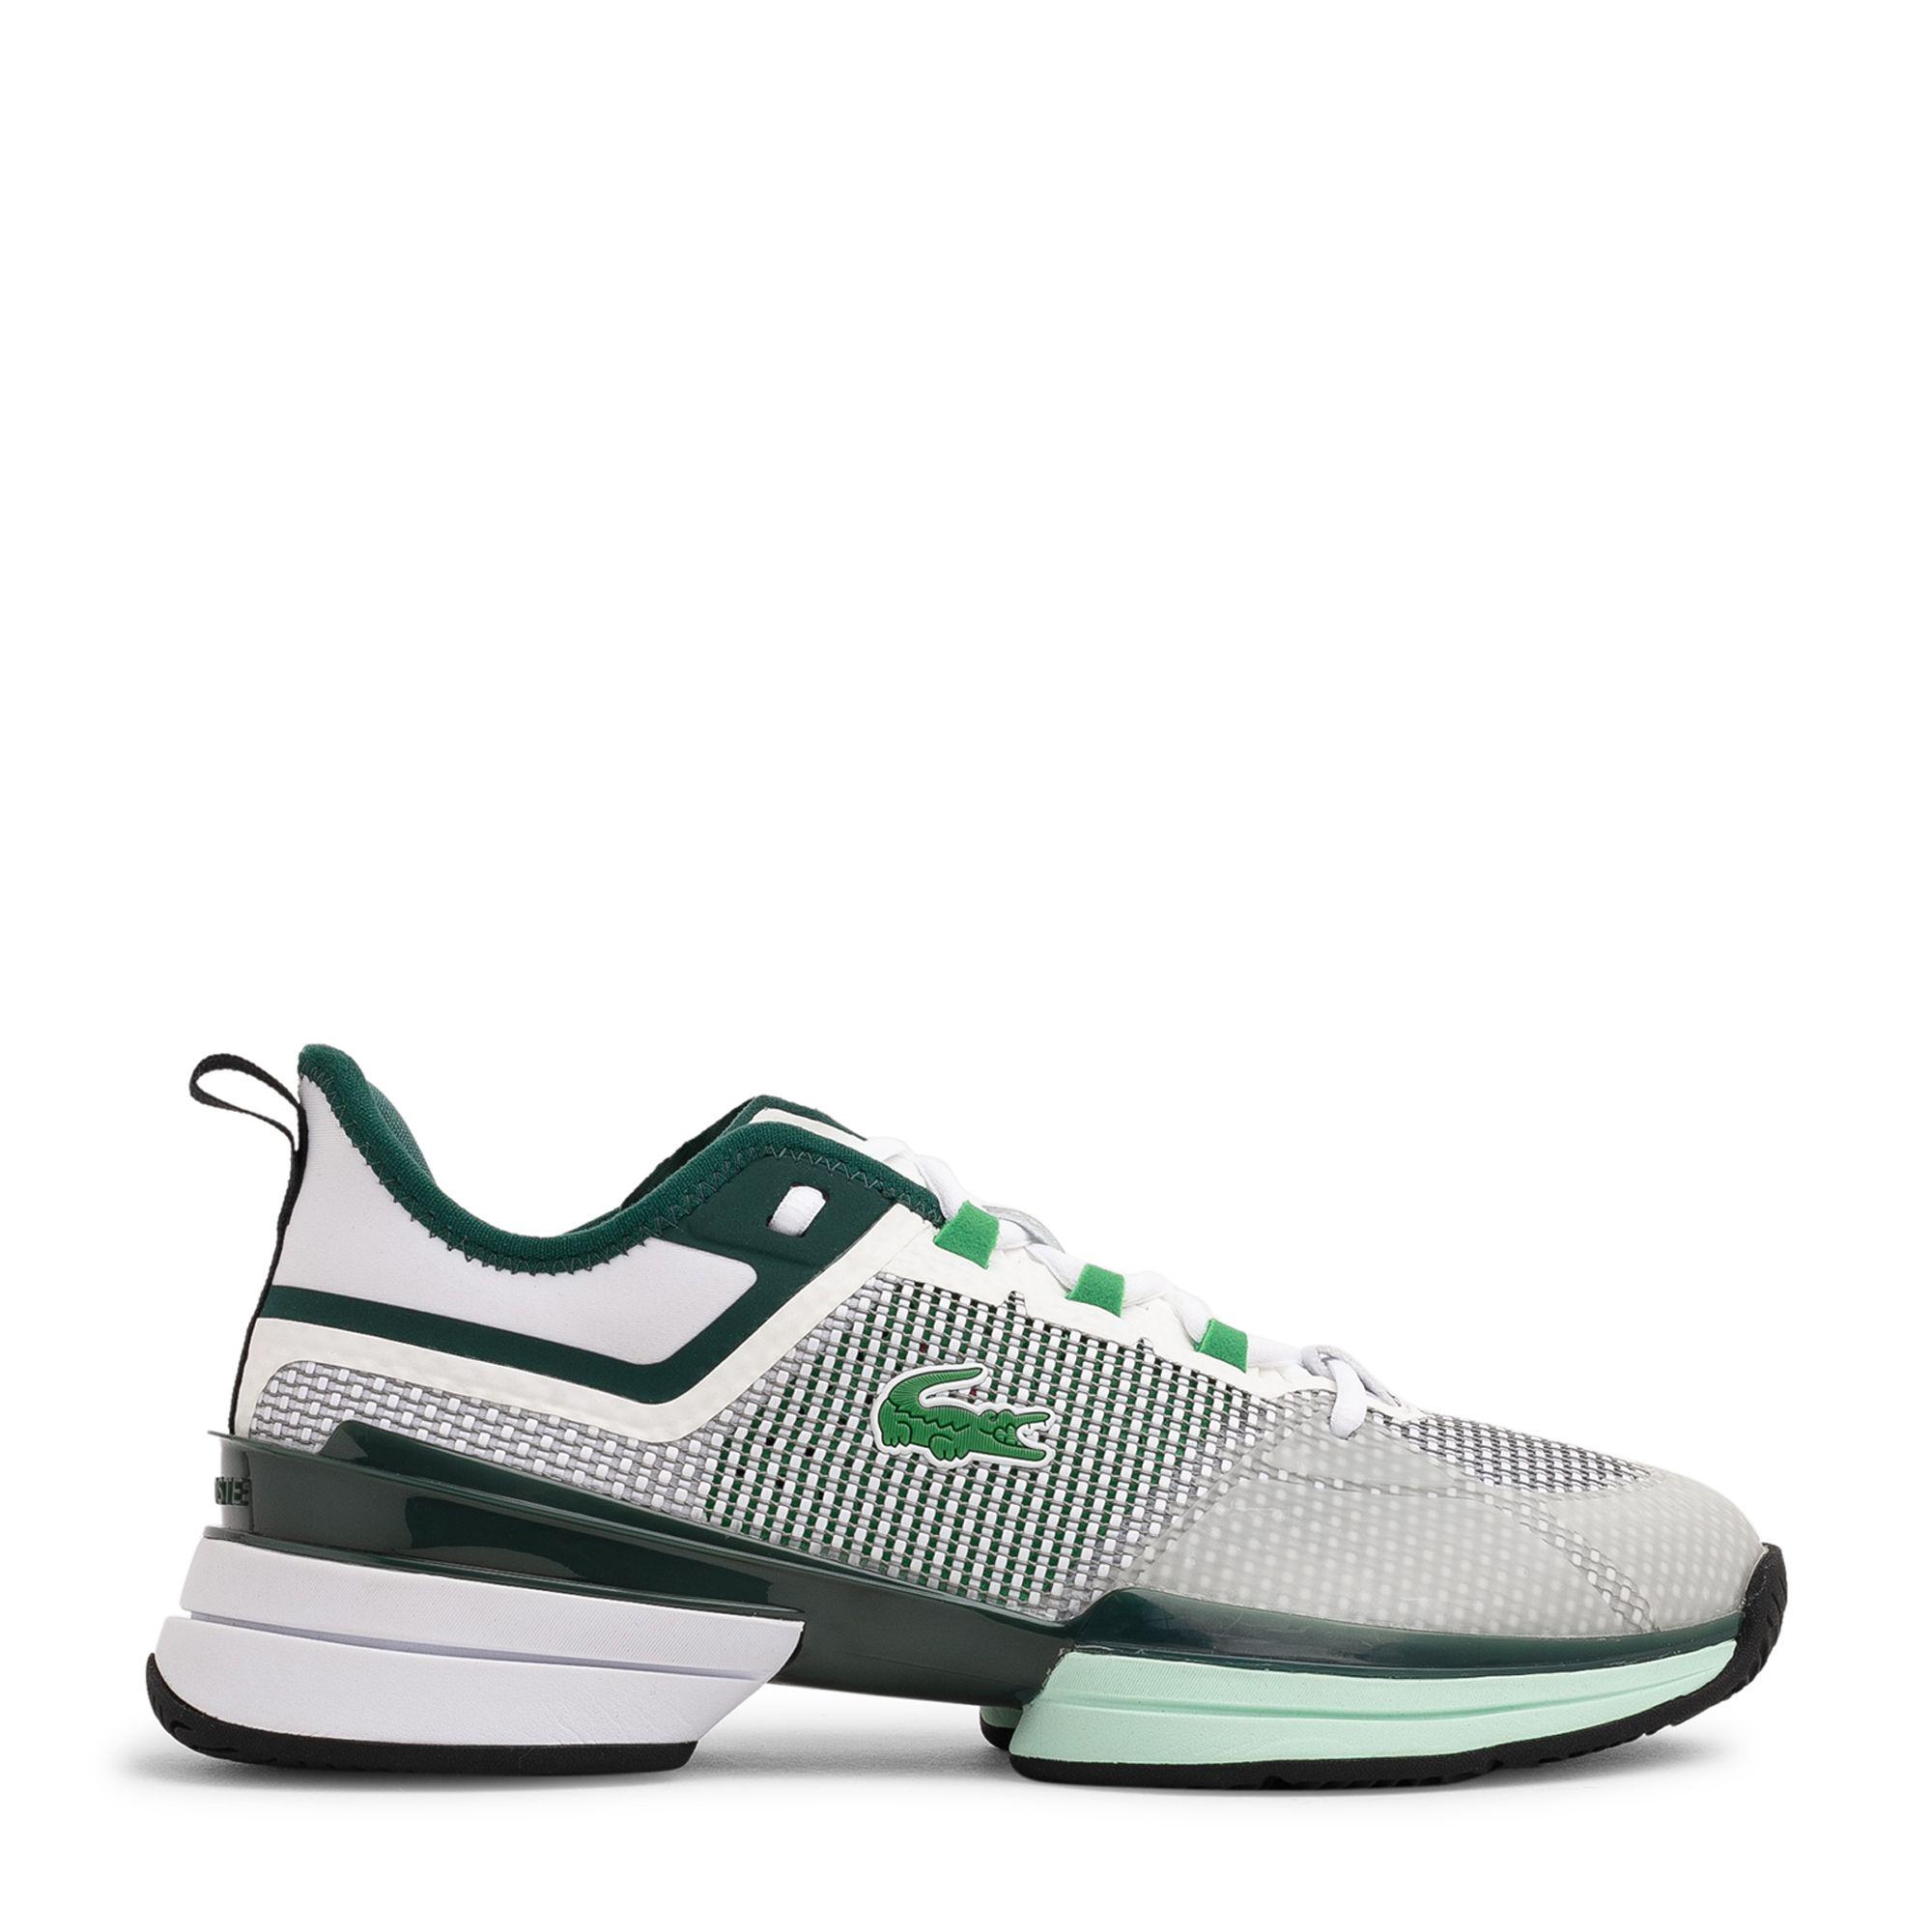 AG-LT 21 Ultra sneakers